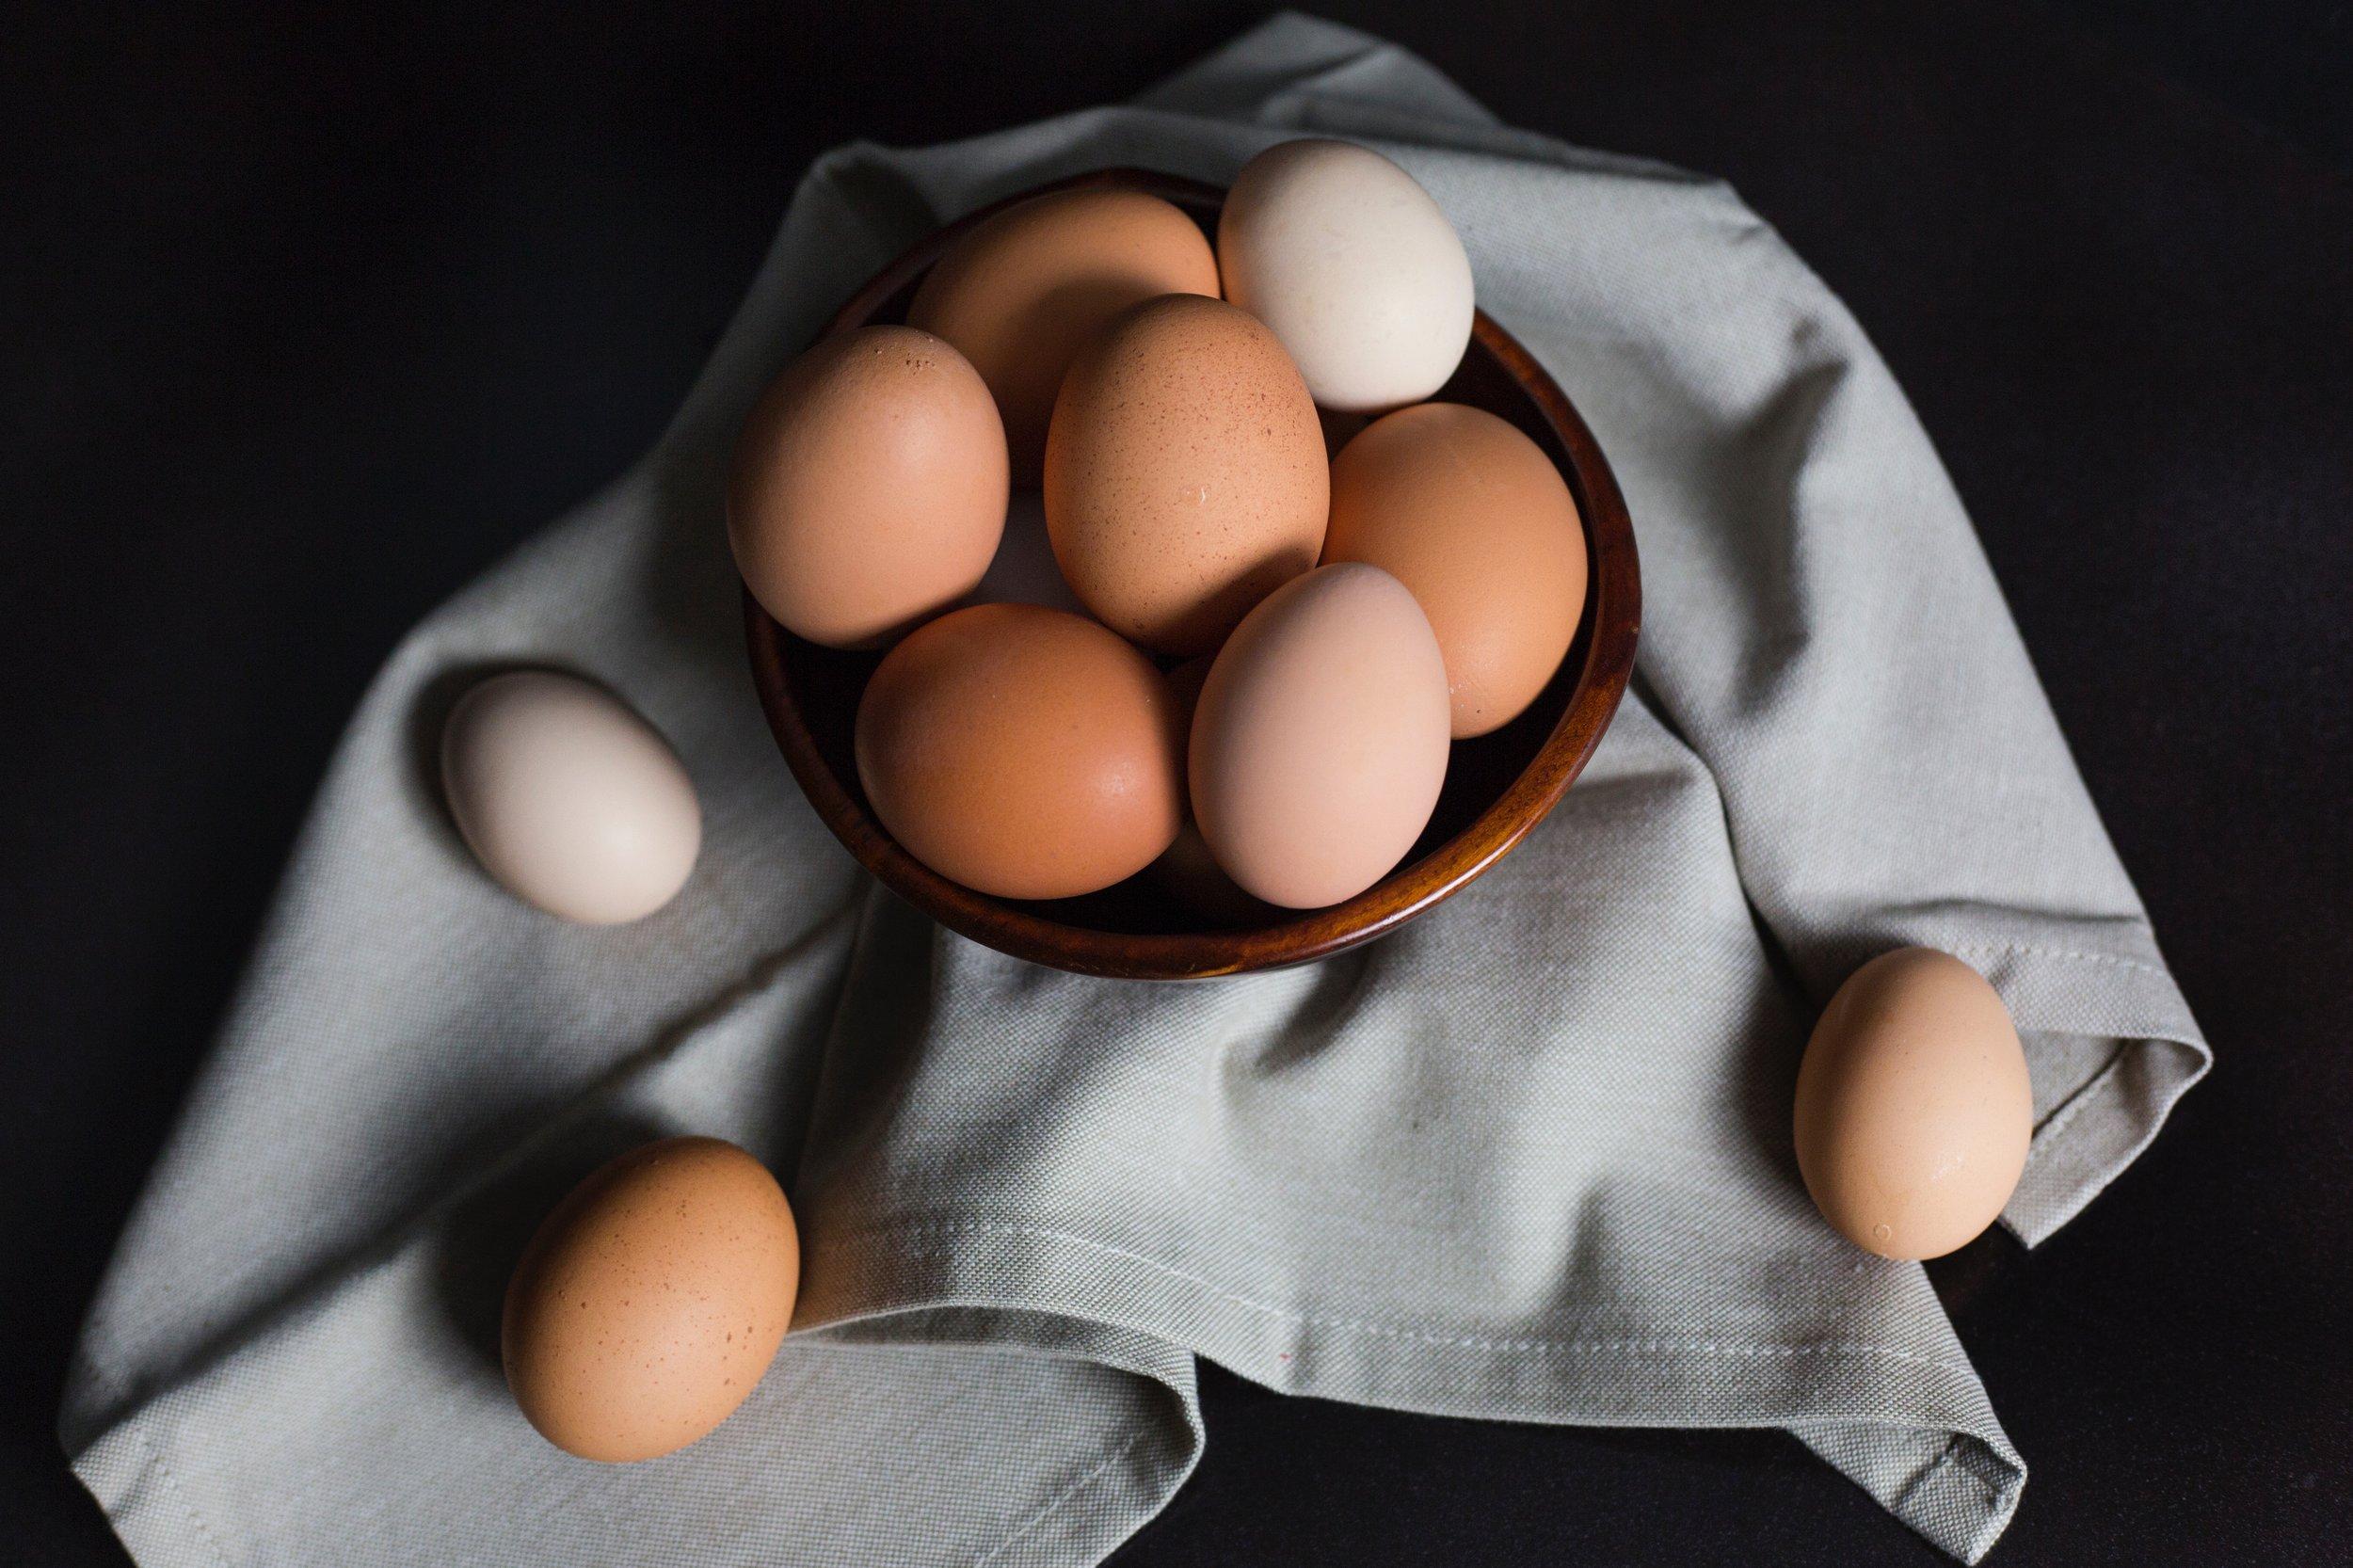 Eggs -